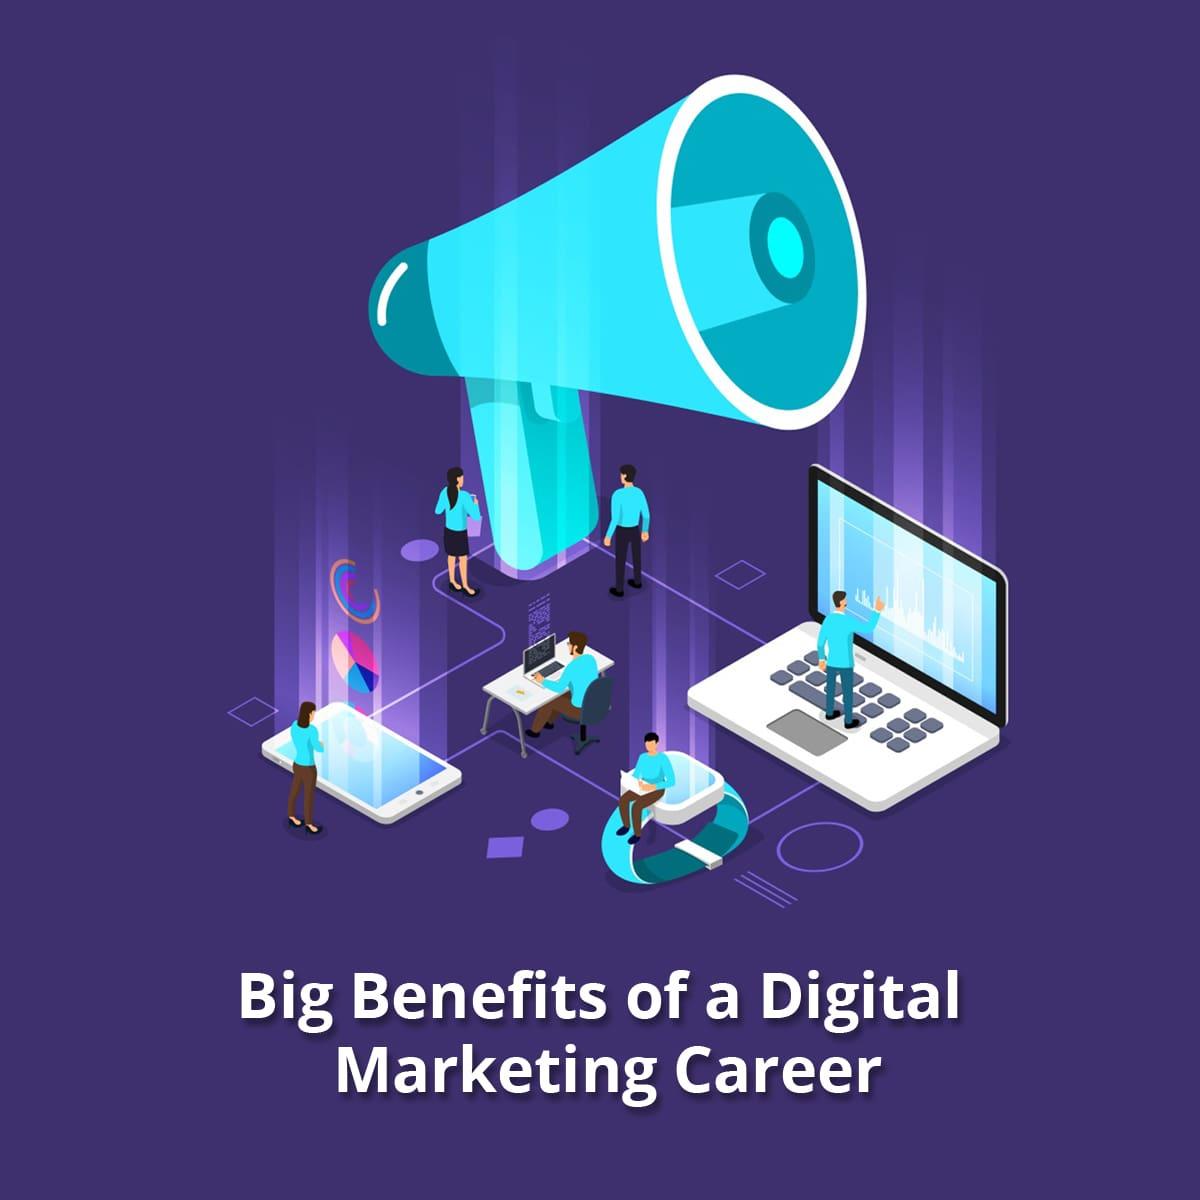 7 Big Benefits of a Digital Marketing Career